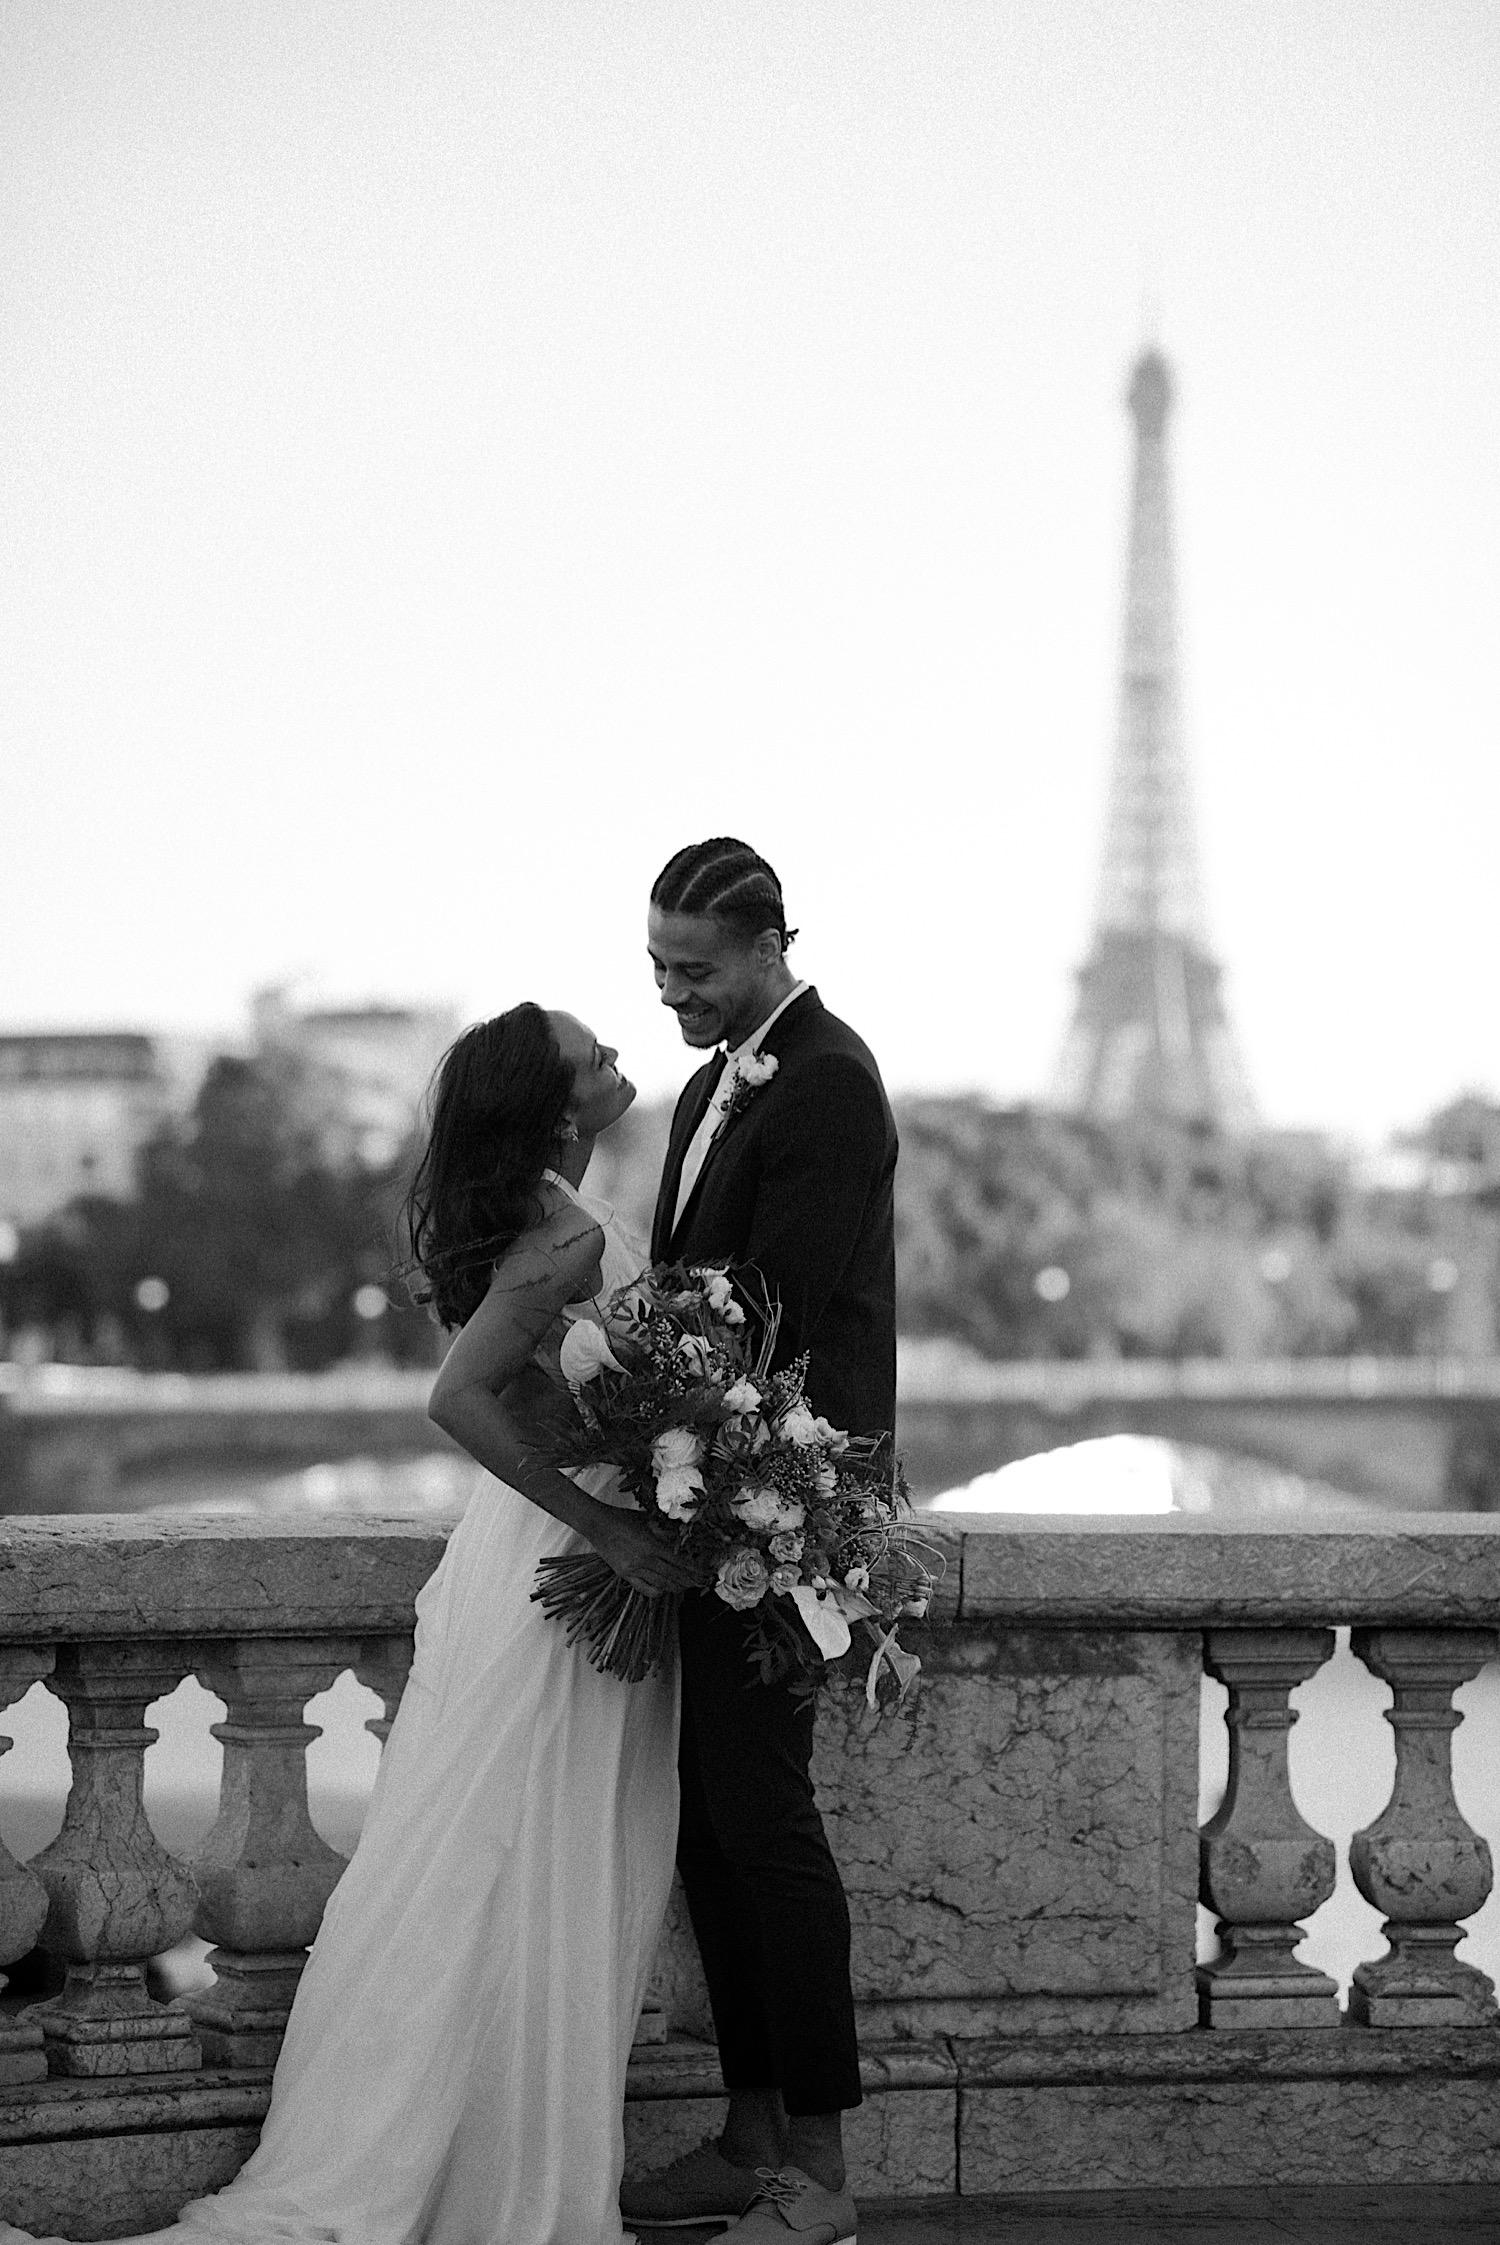 Paris Wedding Photos Paris Wedding Photographer Paris Photographe De Marriage Pont Alexandre Wedding Photos Anais Possamai Photography 20